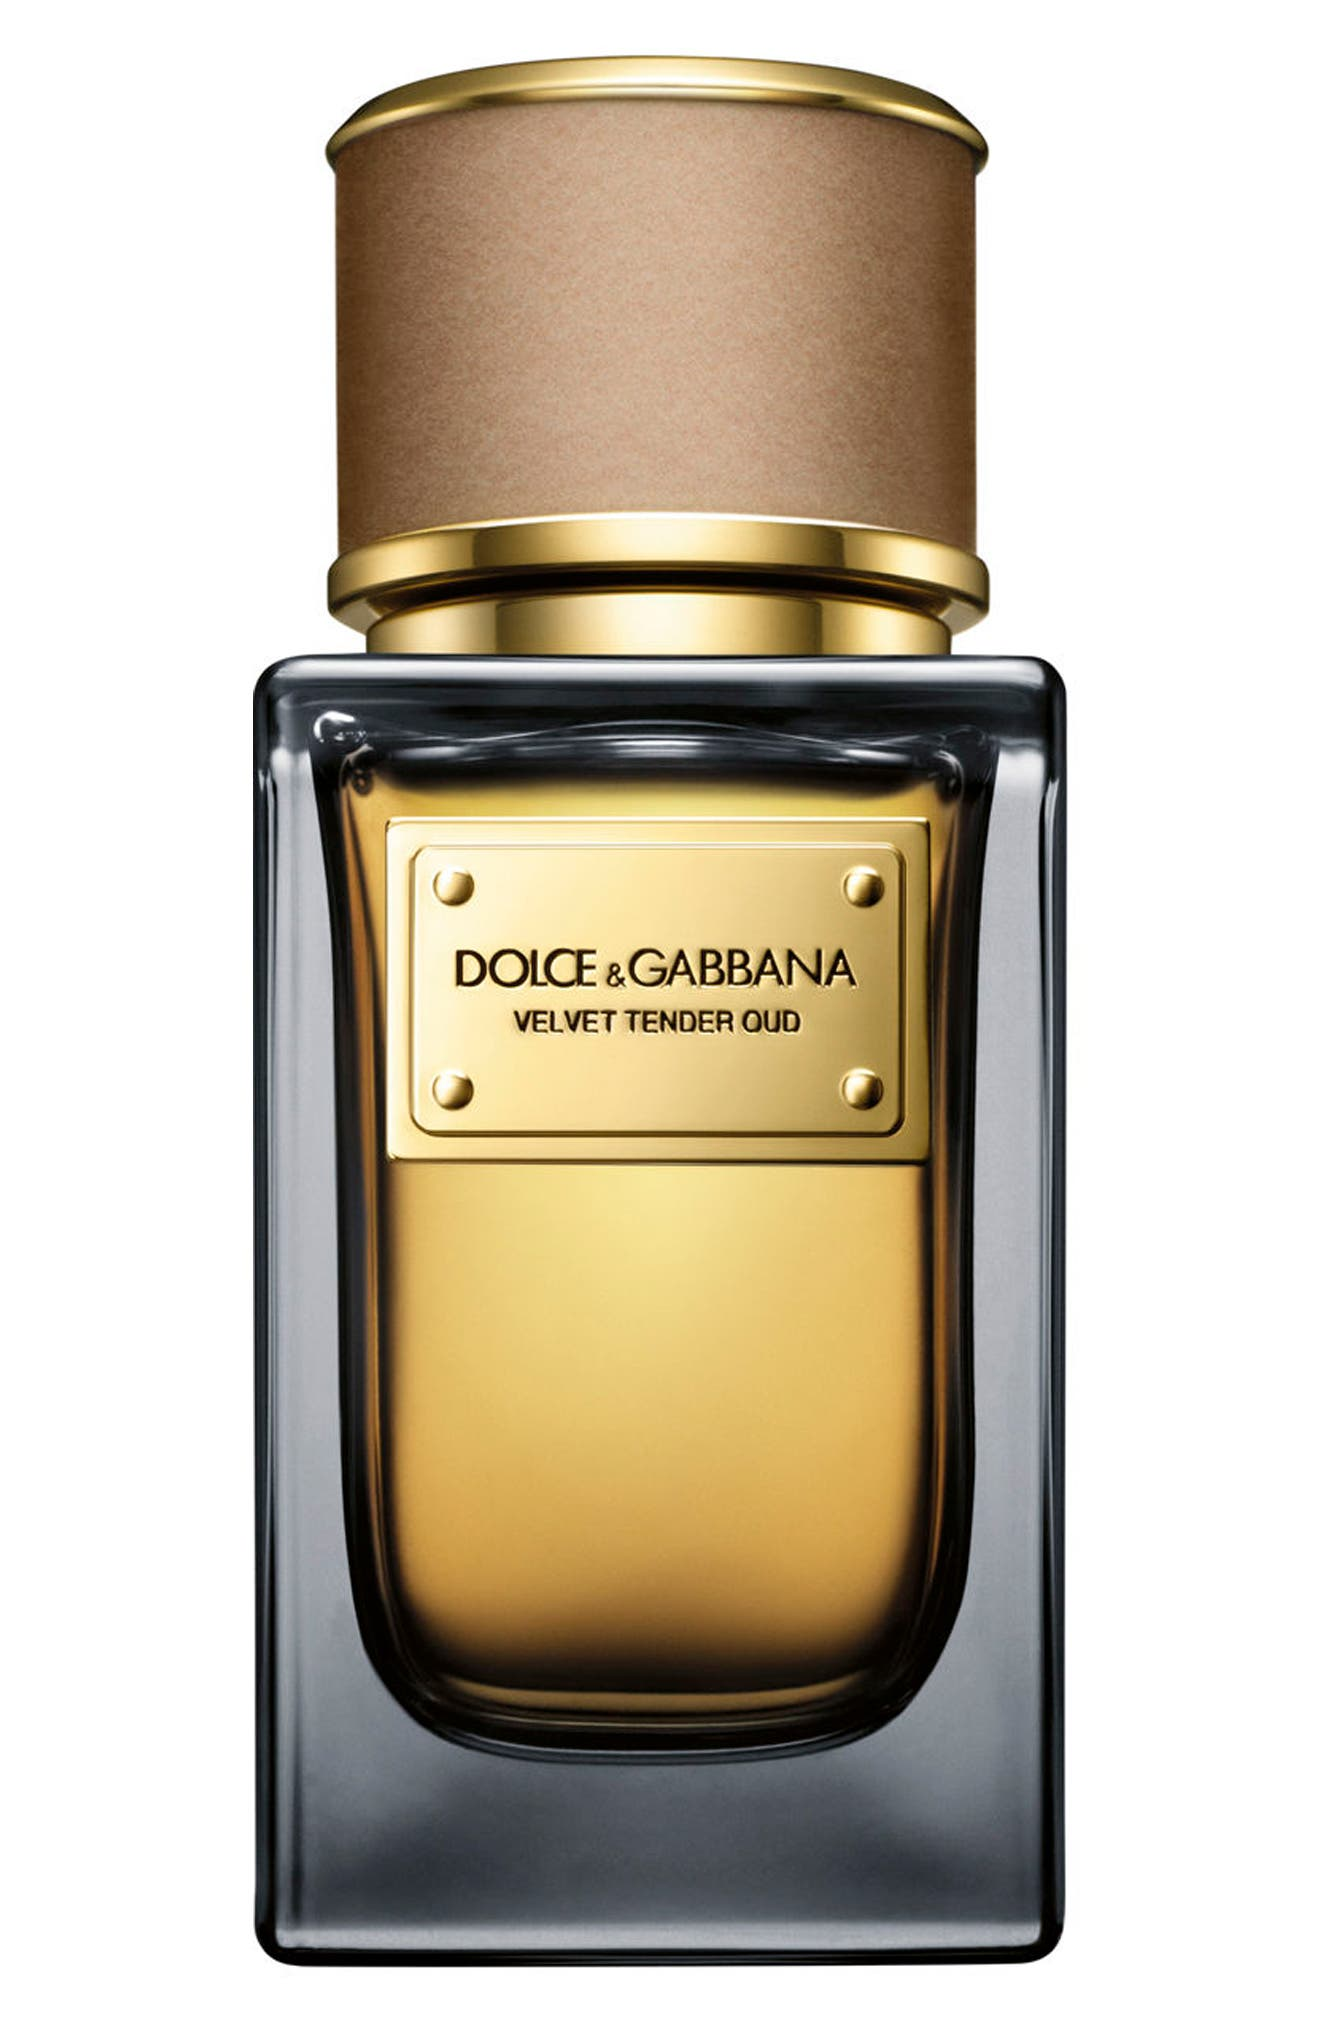 Dolce&GabbanaBeauty 'Velvet Tender Oud' Eau de Parfum